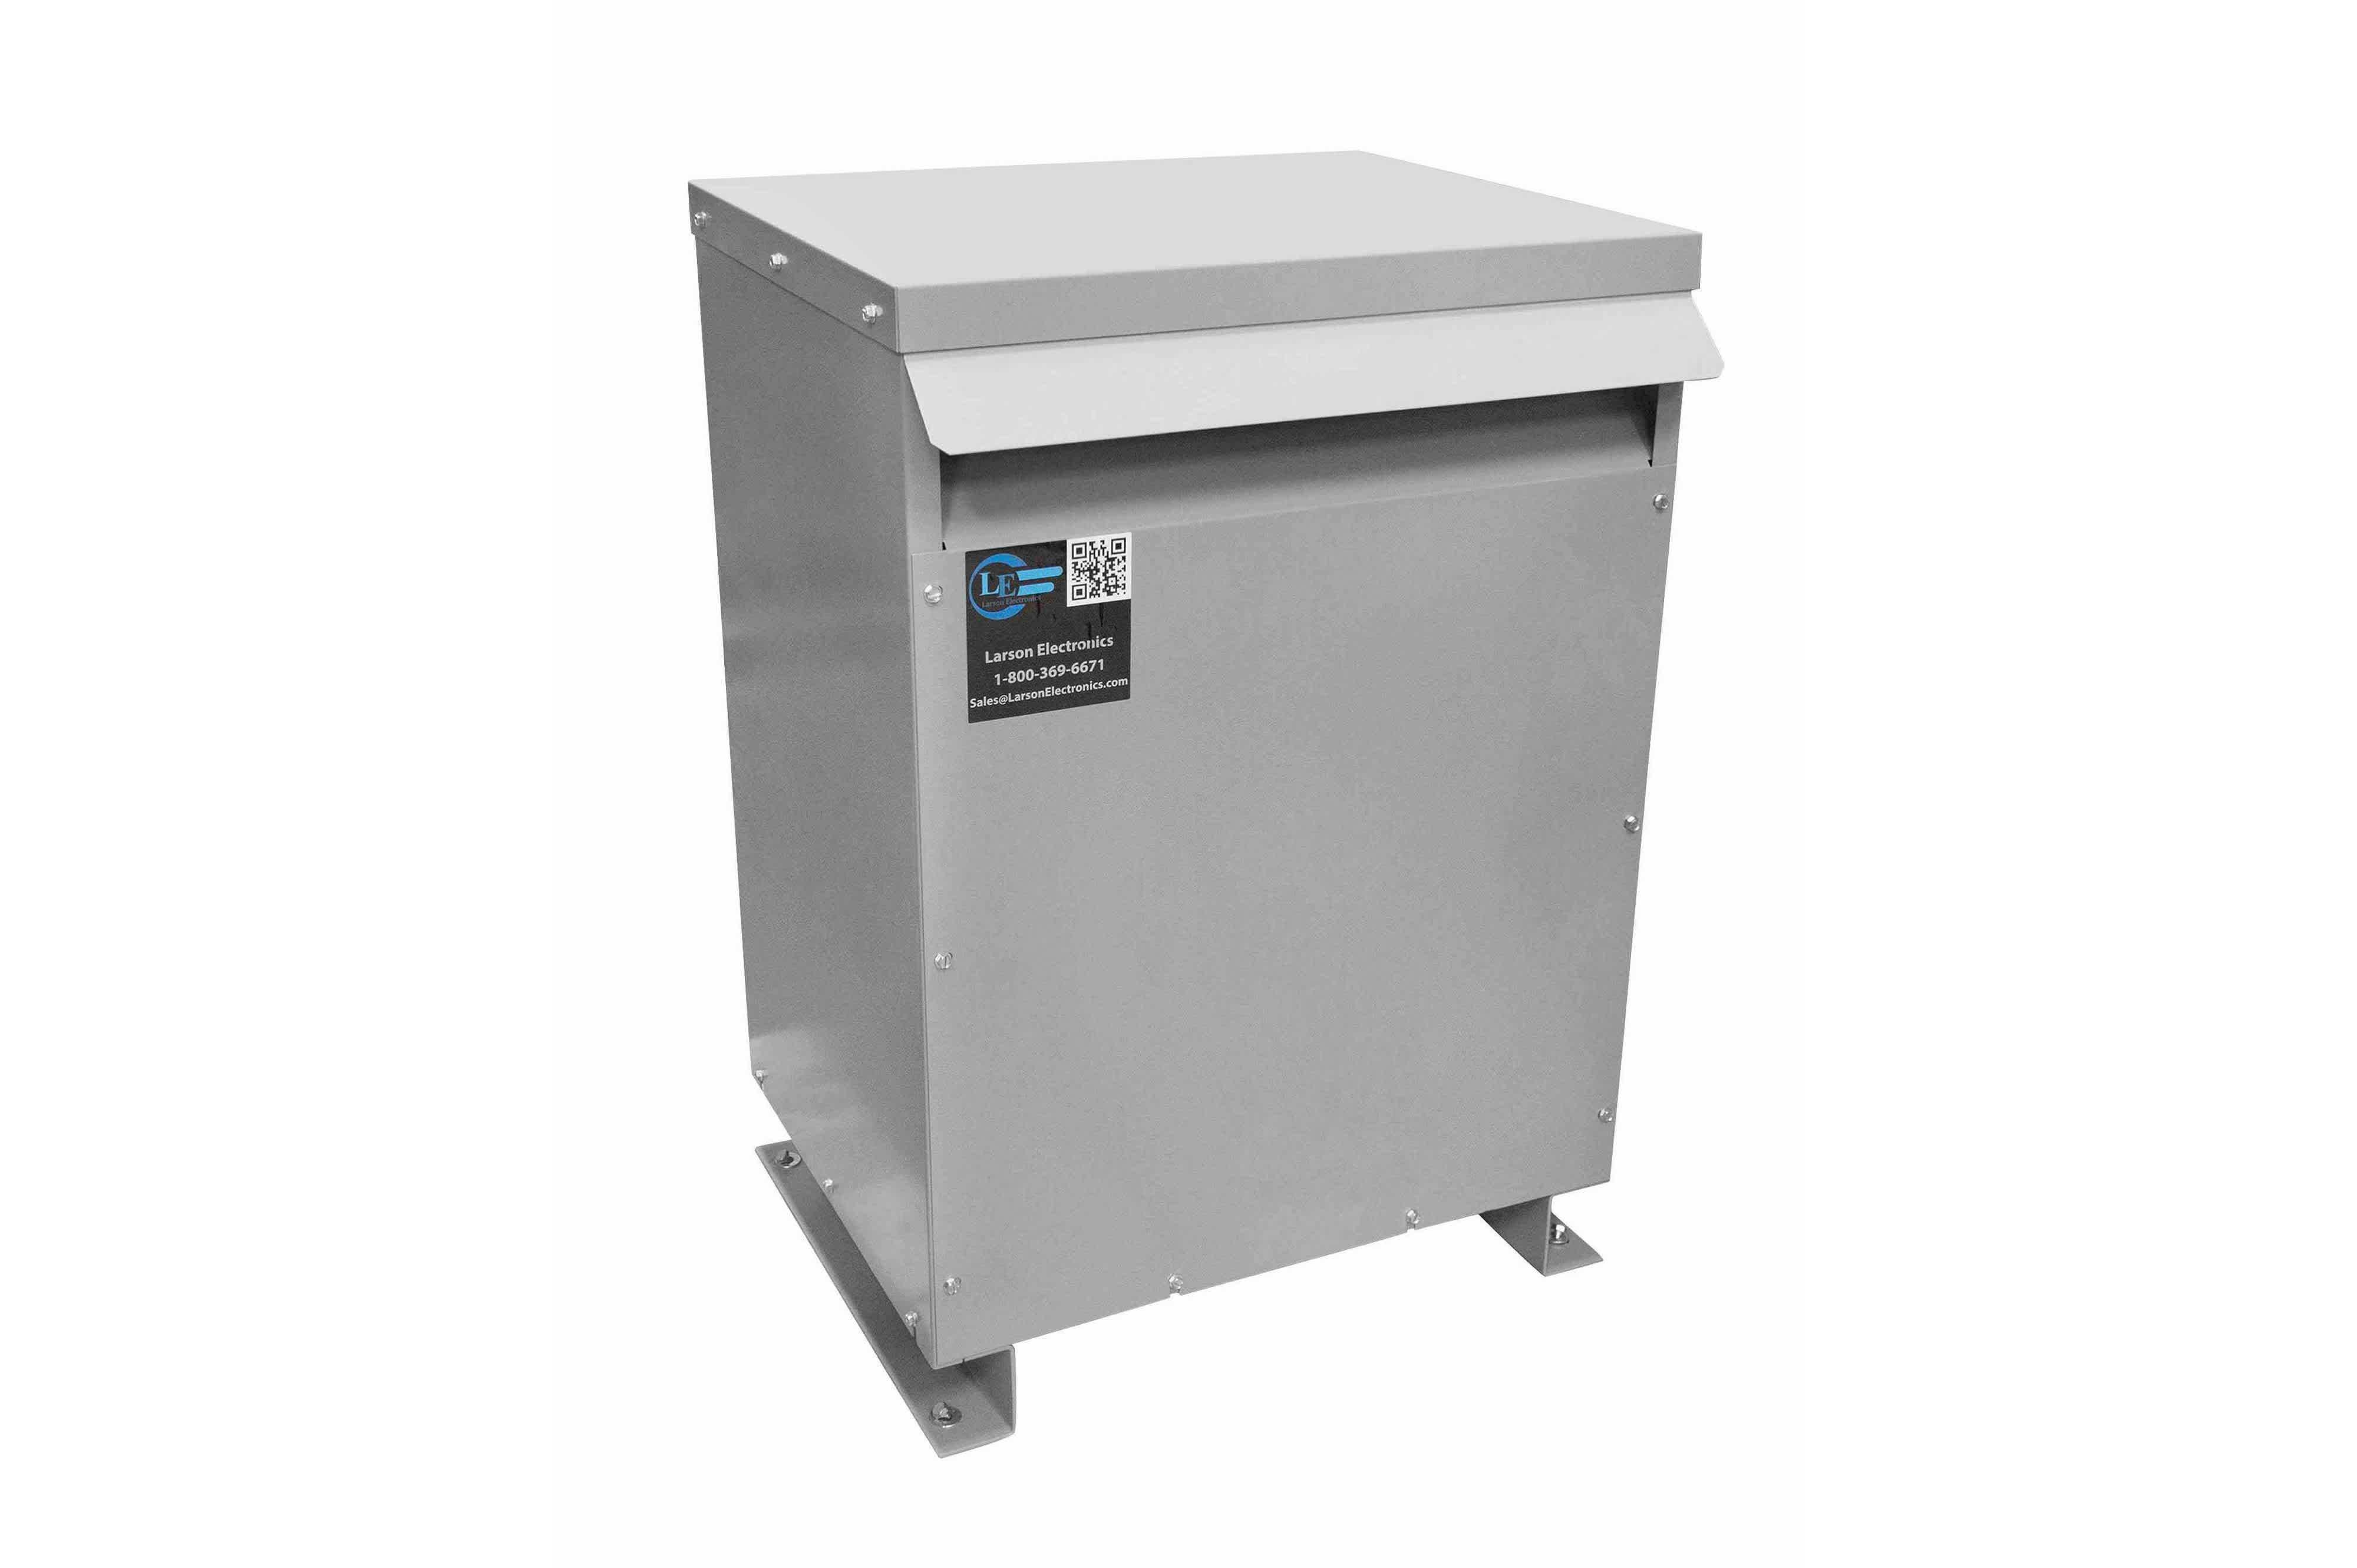 15 kVA 3PH DOE Transformer, 240V Delta Primary, 415Y/240 Wye-N Secondary, N3R, Ventilated, 60 Hz